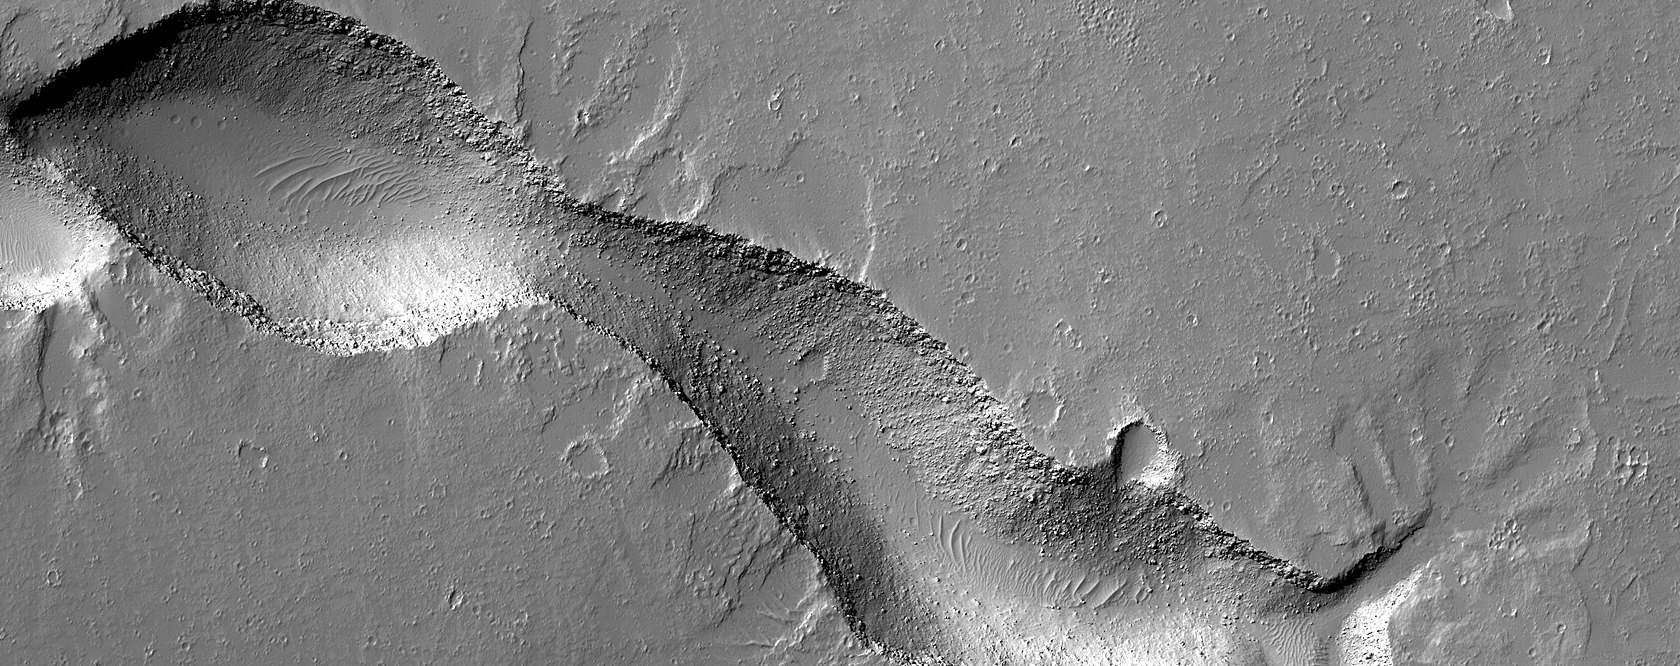 A Gecko-Shaped Fissure Vent in Gordii Fossae